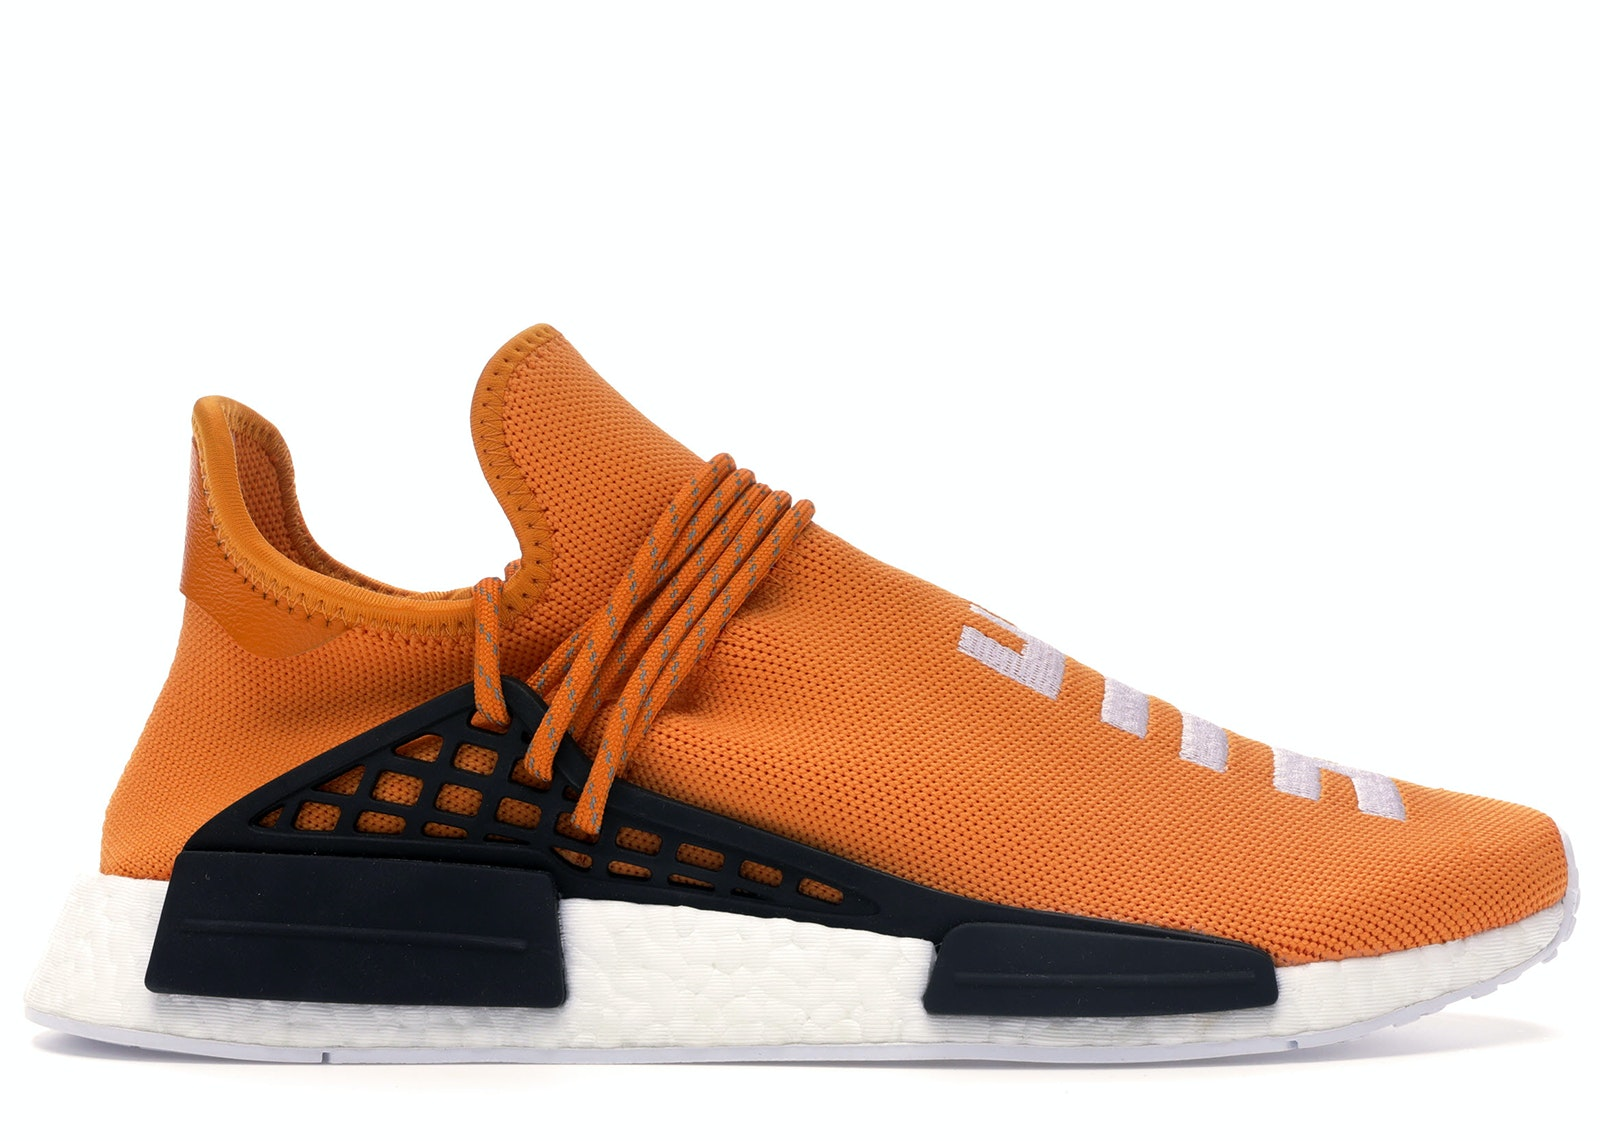 adidas NMD R1 Pharrell HU Hue Man Tangerine